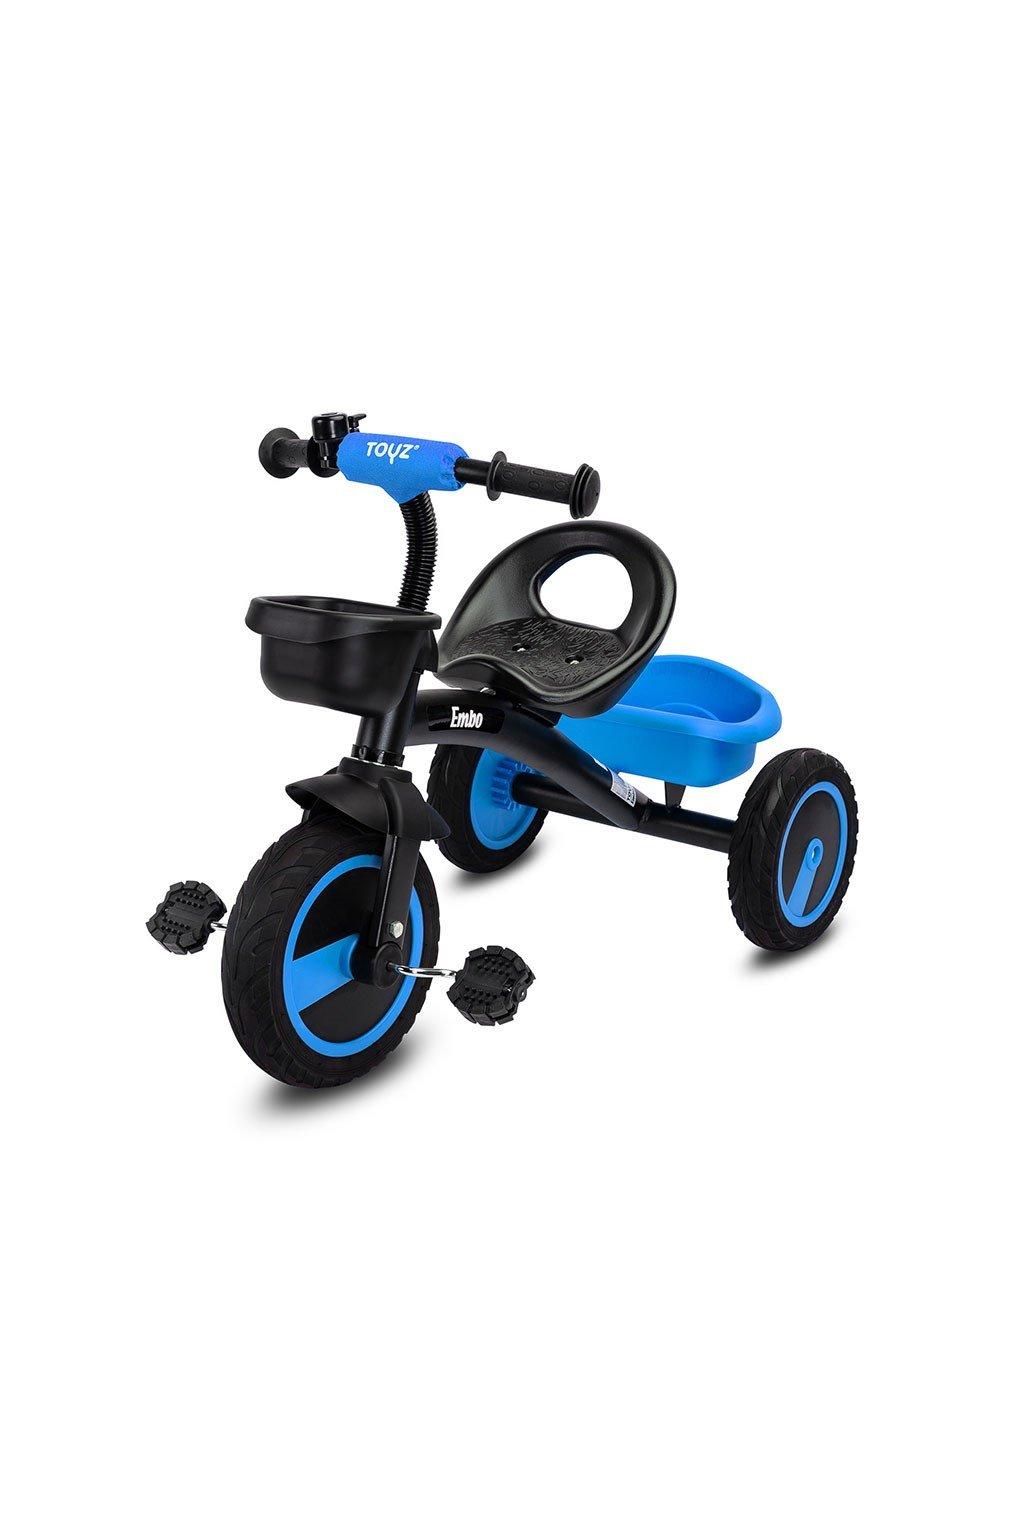 Detská trojkolka Toyz Embo blue